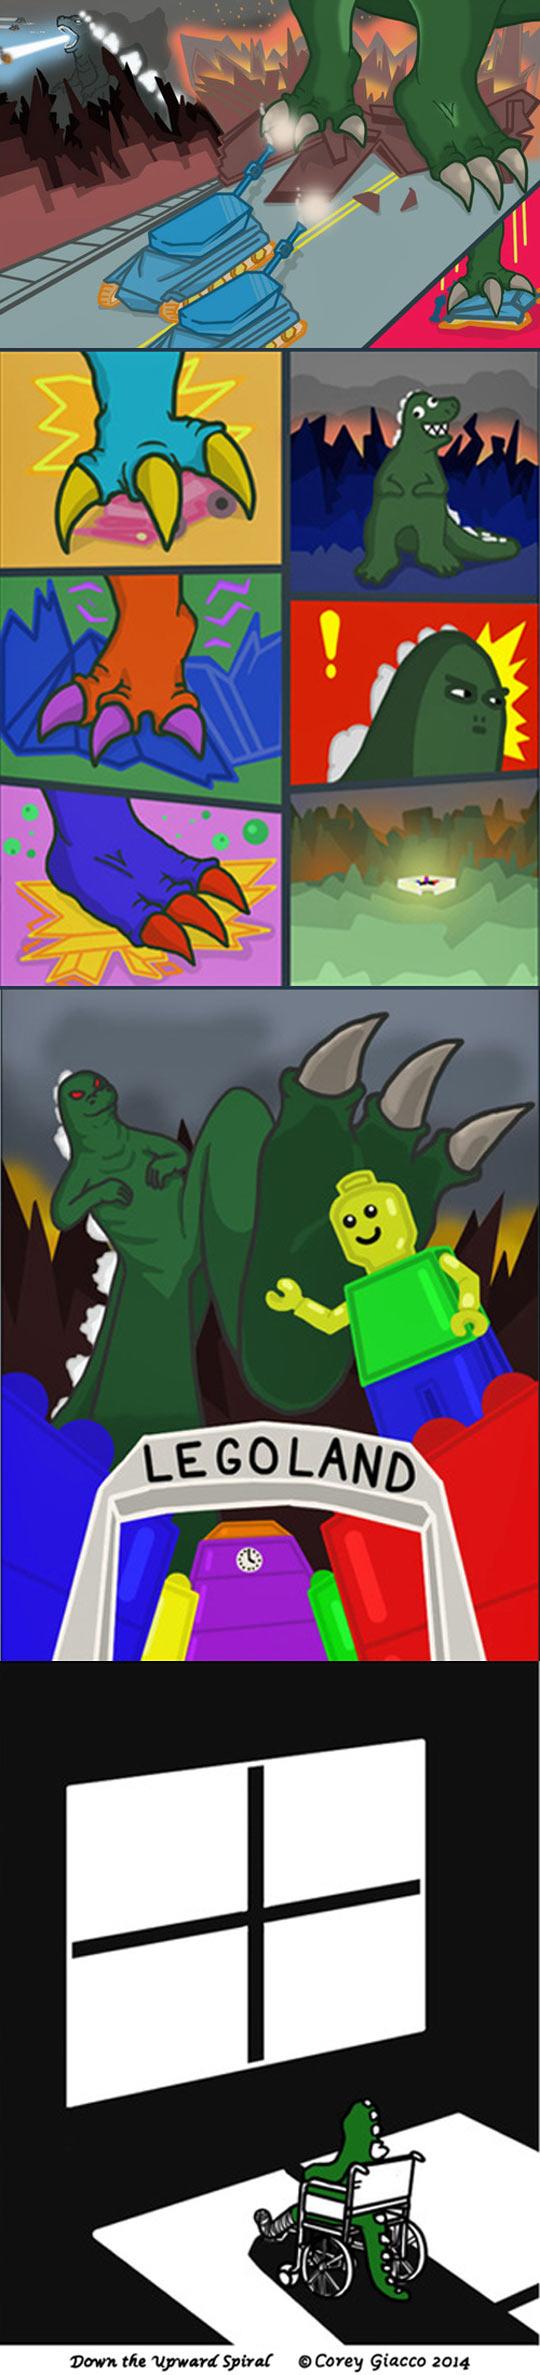 Godzilla At Legoland